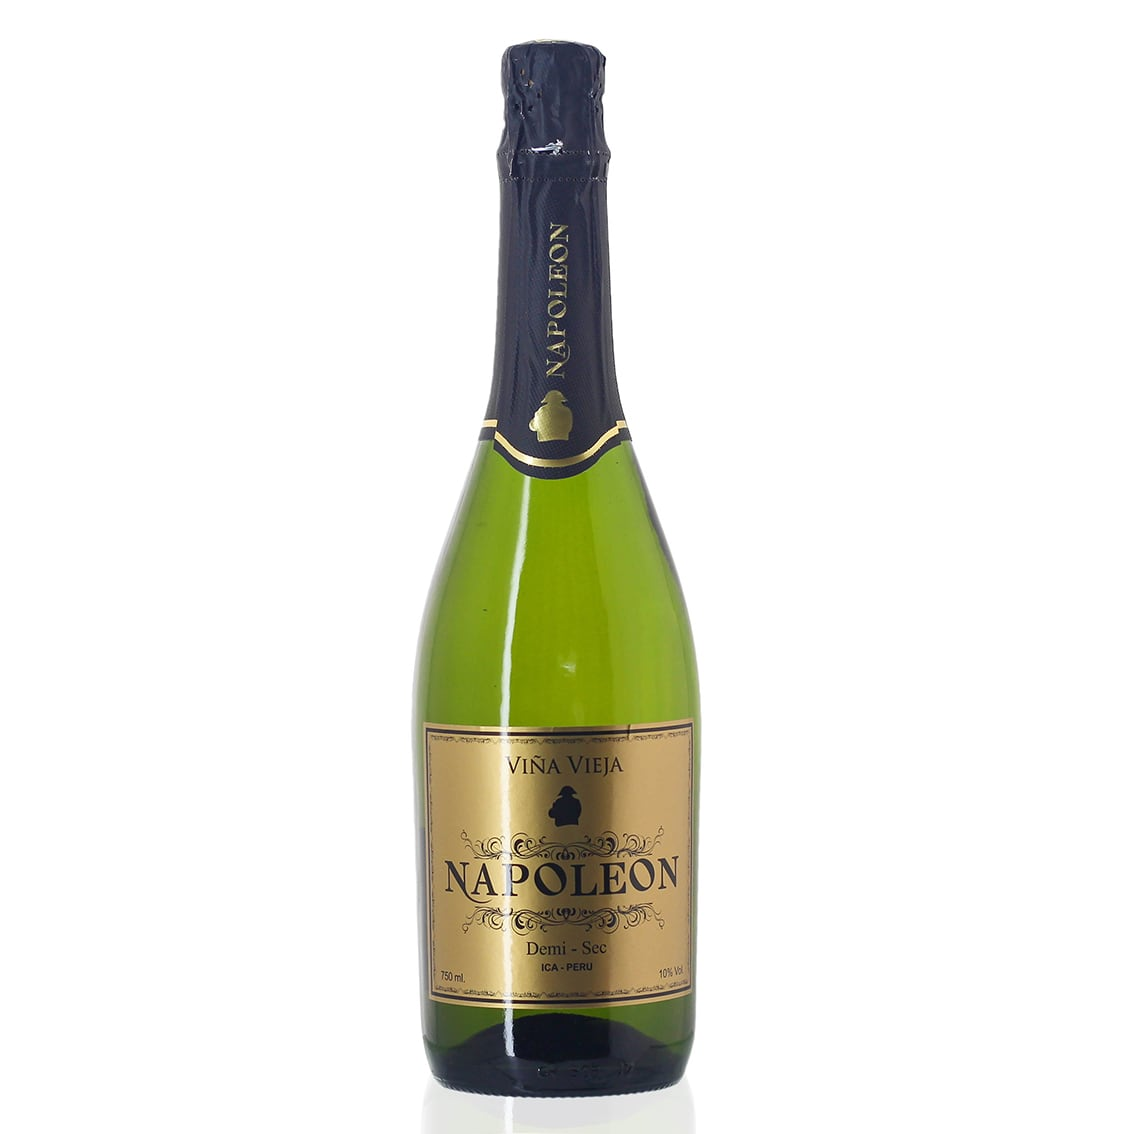 Espumante VIÑA VIEJA Napoleon Demi Sec Botella 750ml